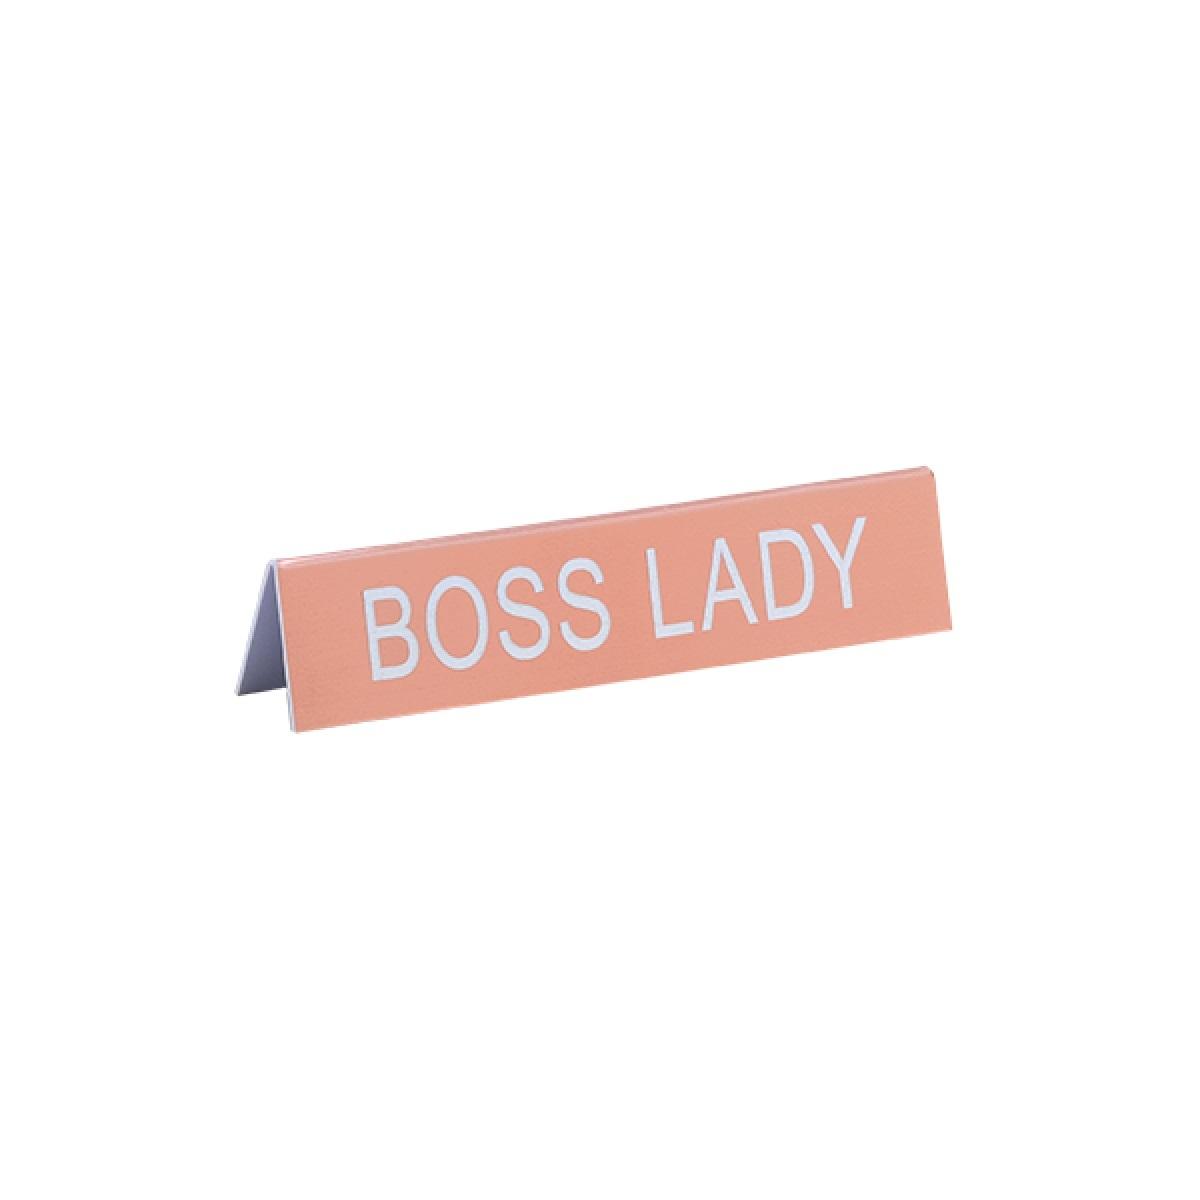 Desk Sign Medium - Boss Lady image